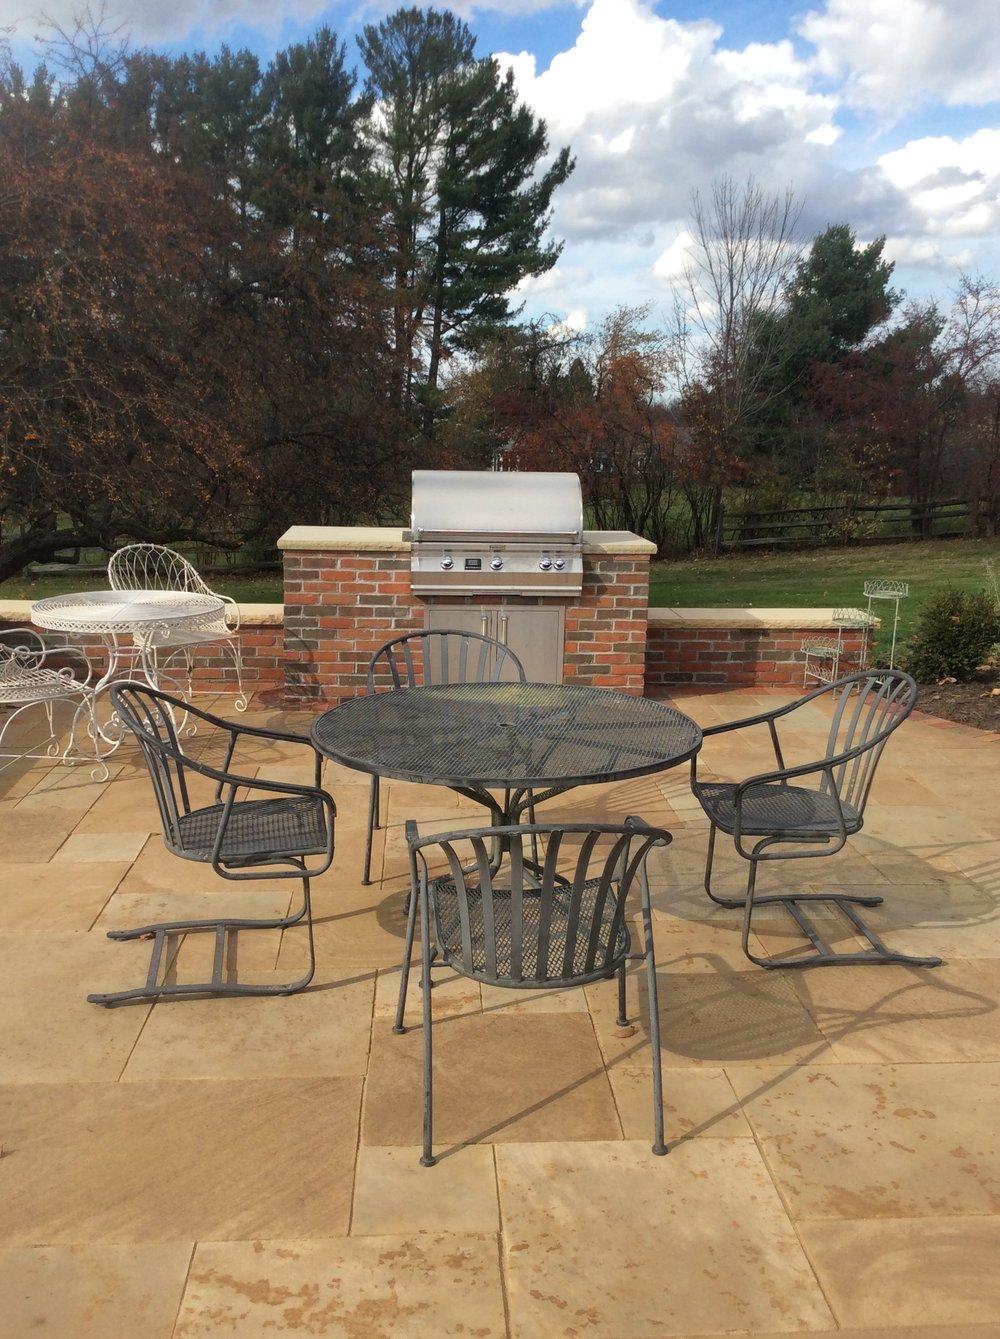 Retaining wall landscape design, patio pavers in Bainbridge Township, OH